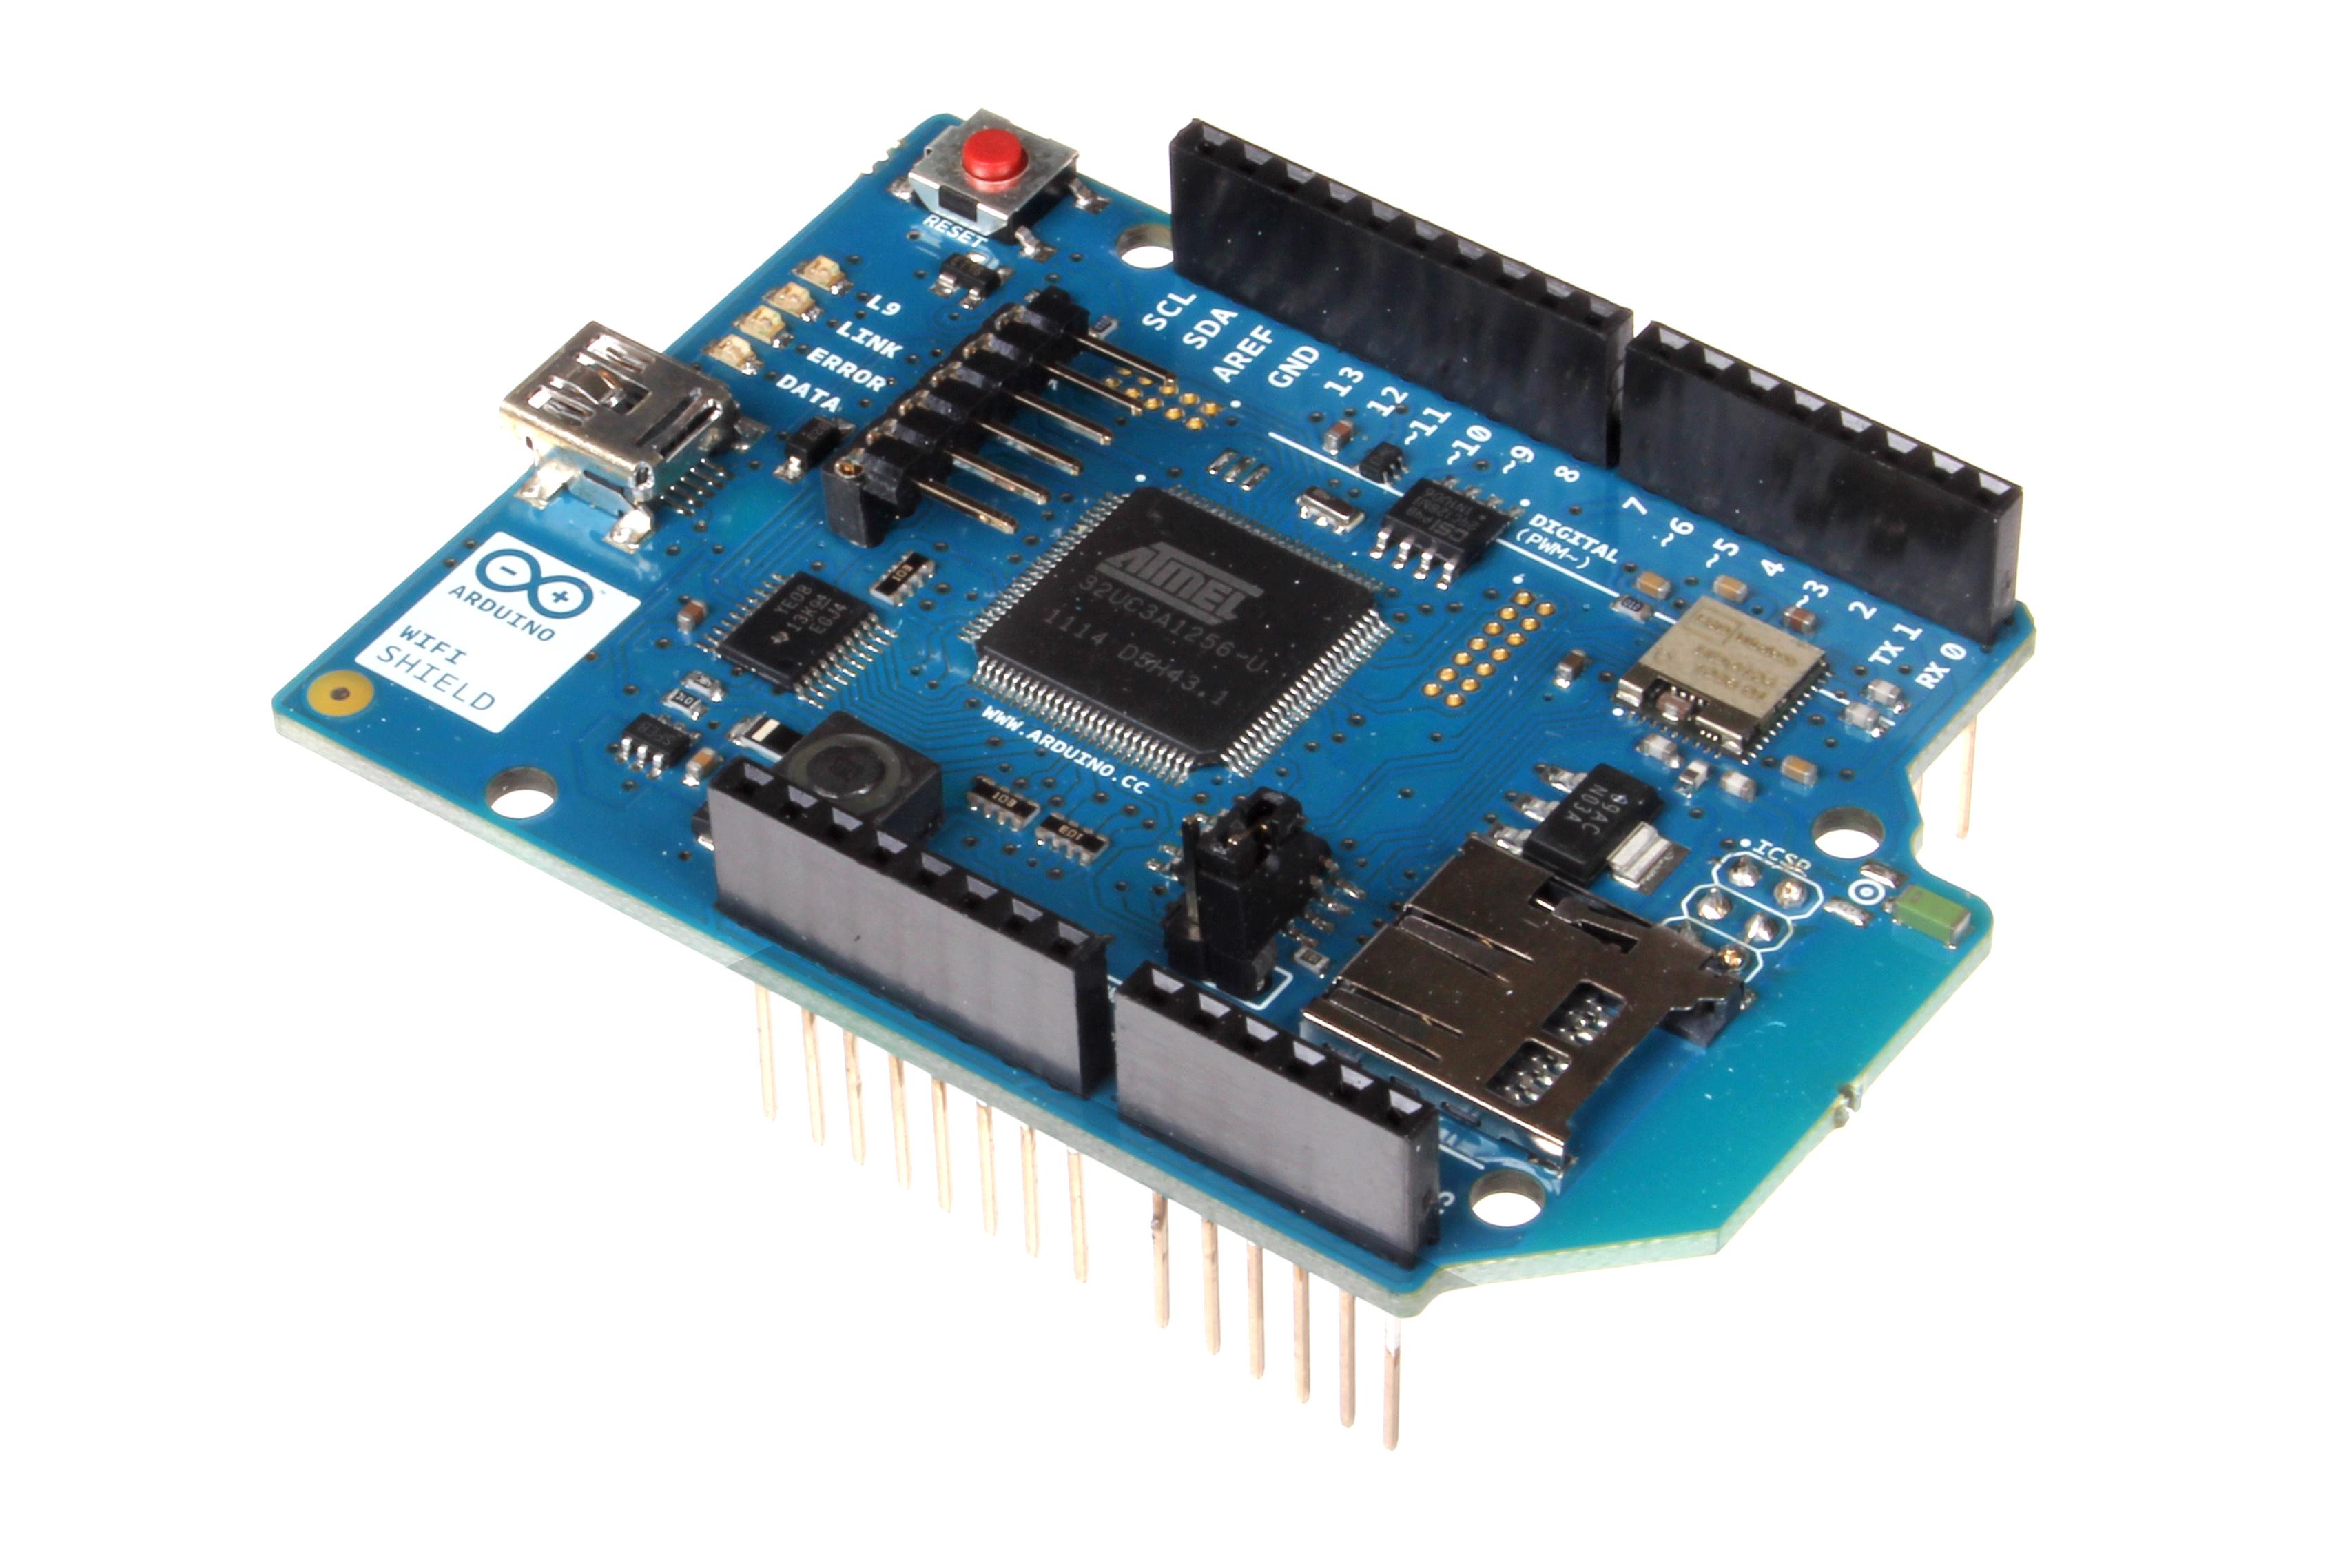 nRF905 or nRF24L01 or WiFi wireless shield for Arduino